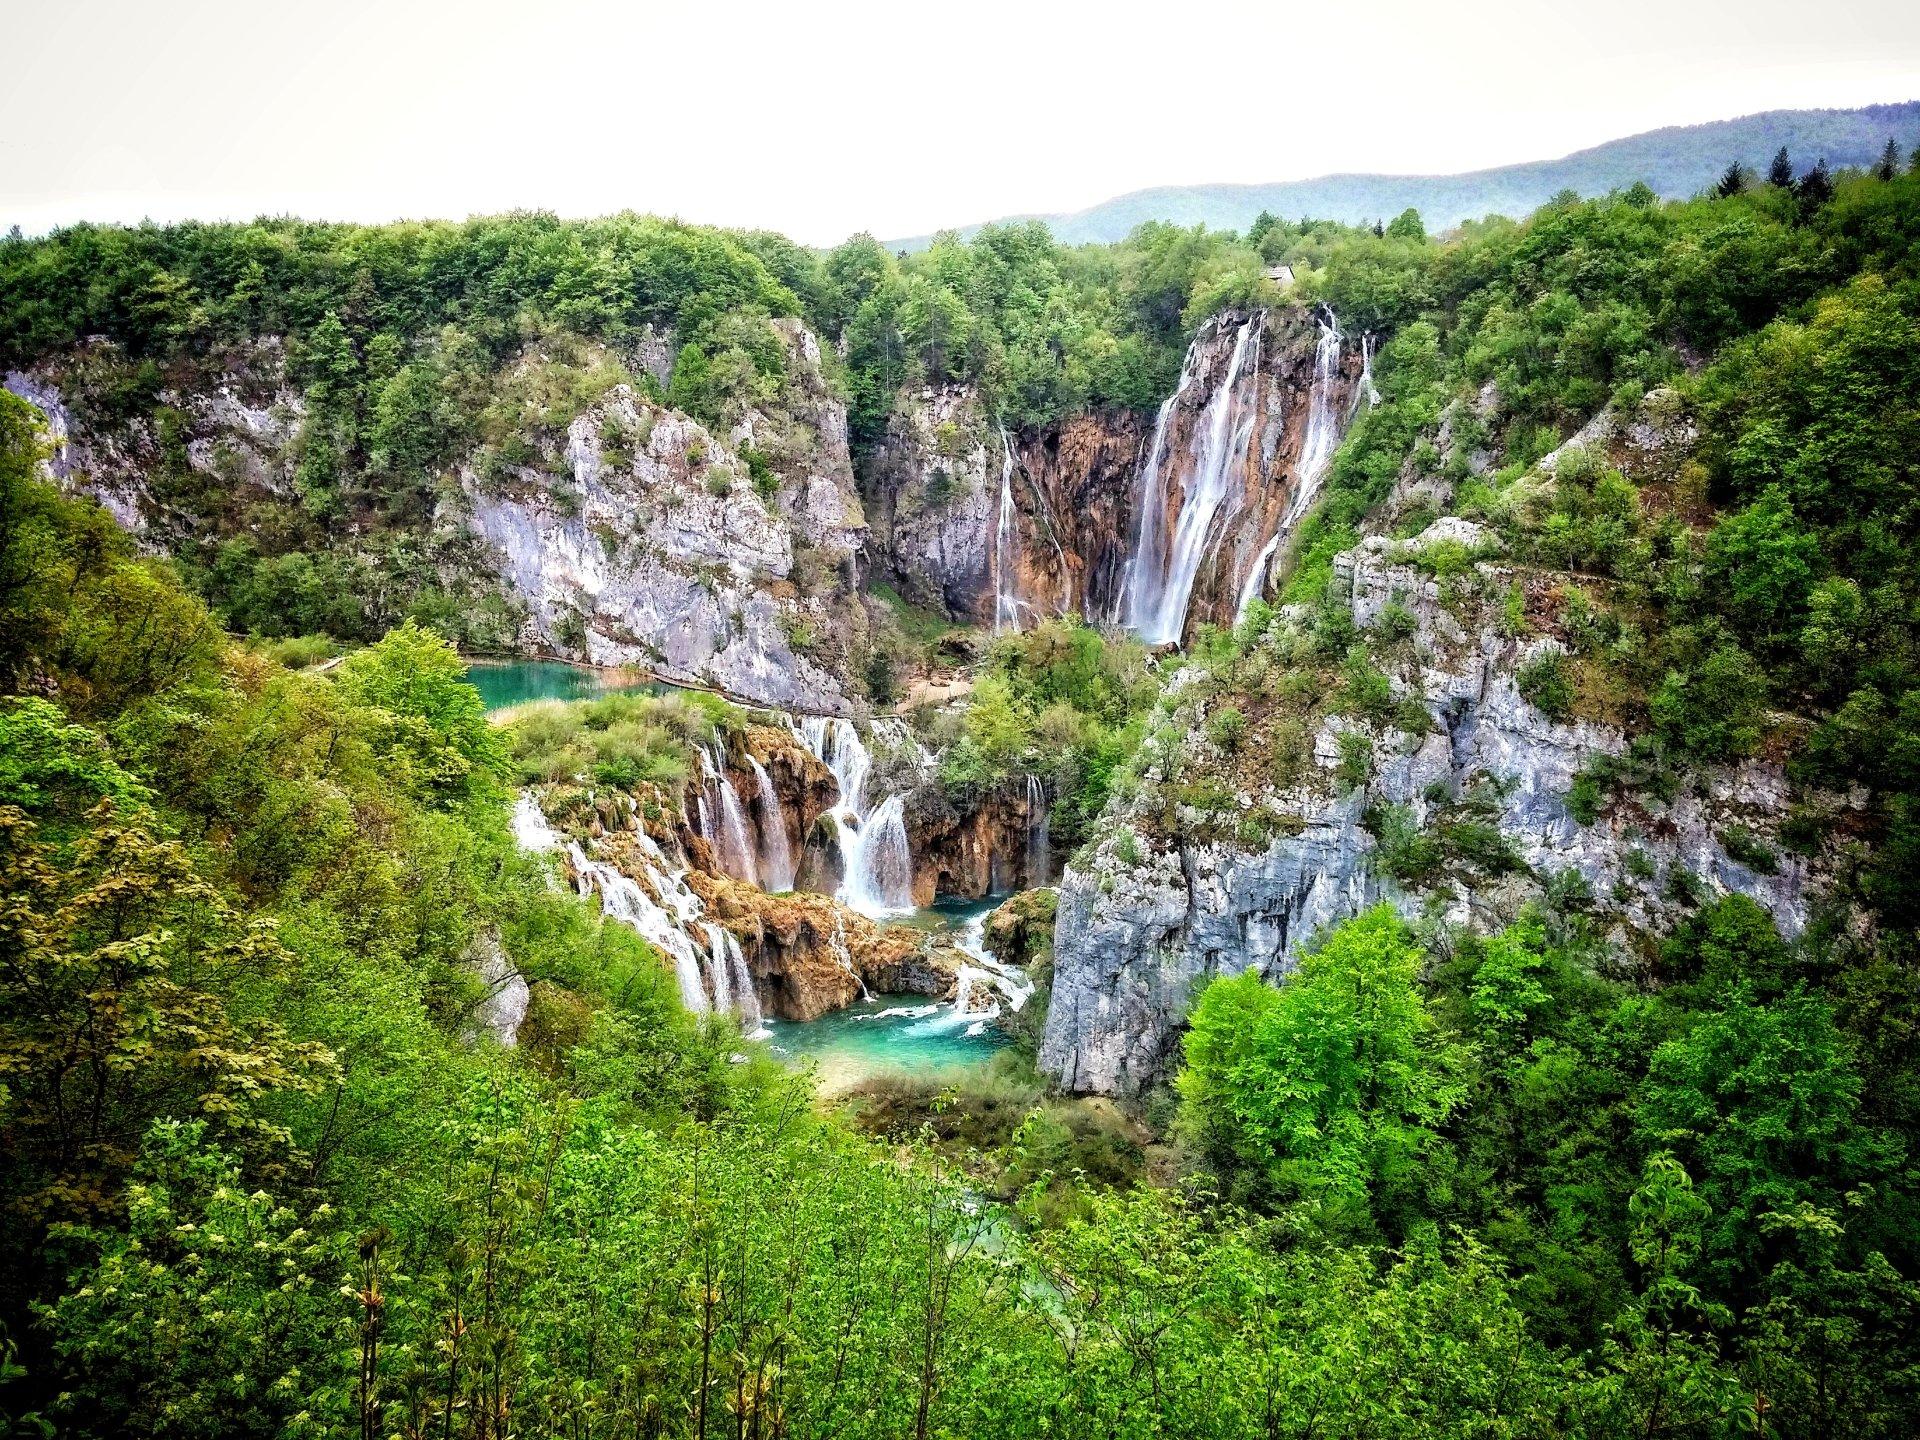 Plitvice lakes national park in croatia 4k ultra hd wallpaper background image 4160x3120 - Plitvice lakes hd ...